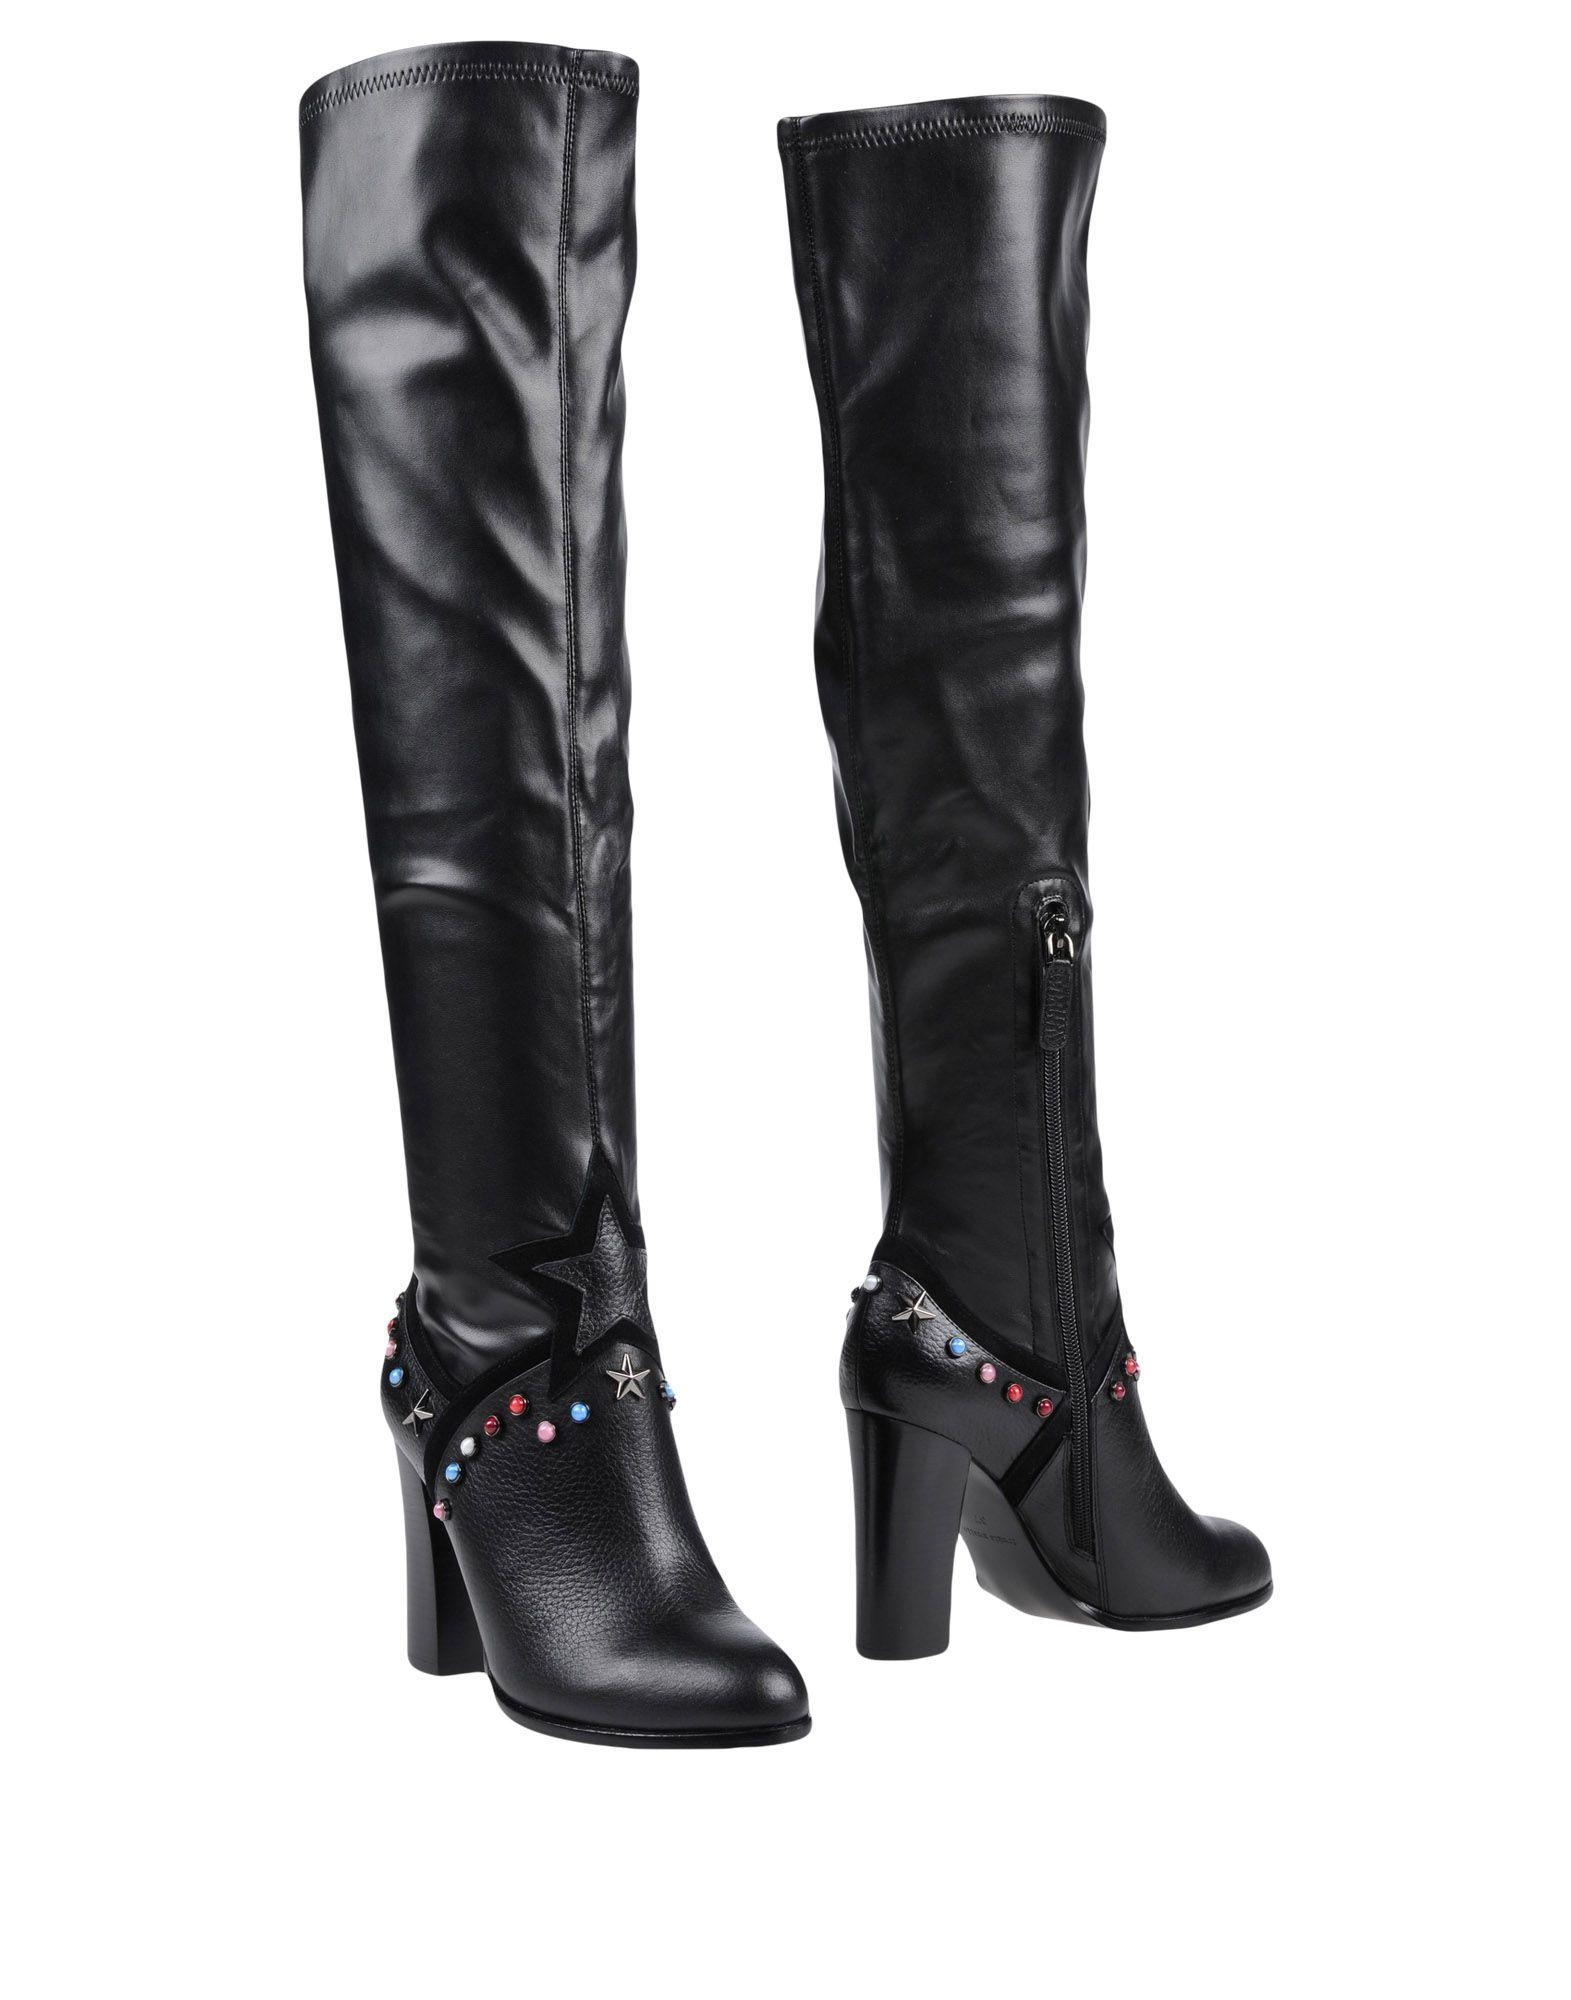 Frankie Morello Boots In Black